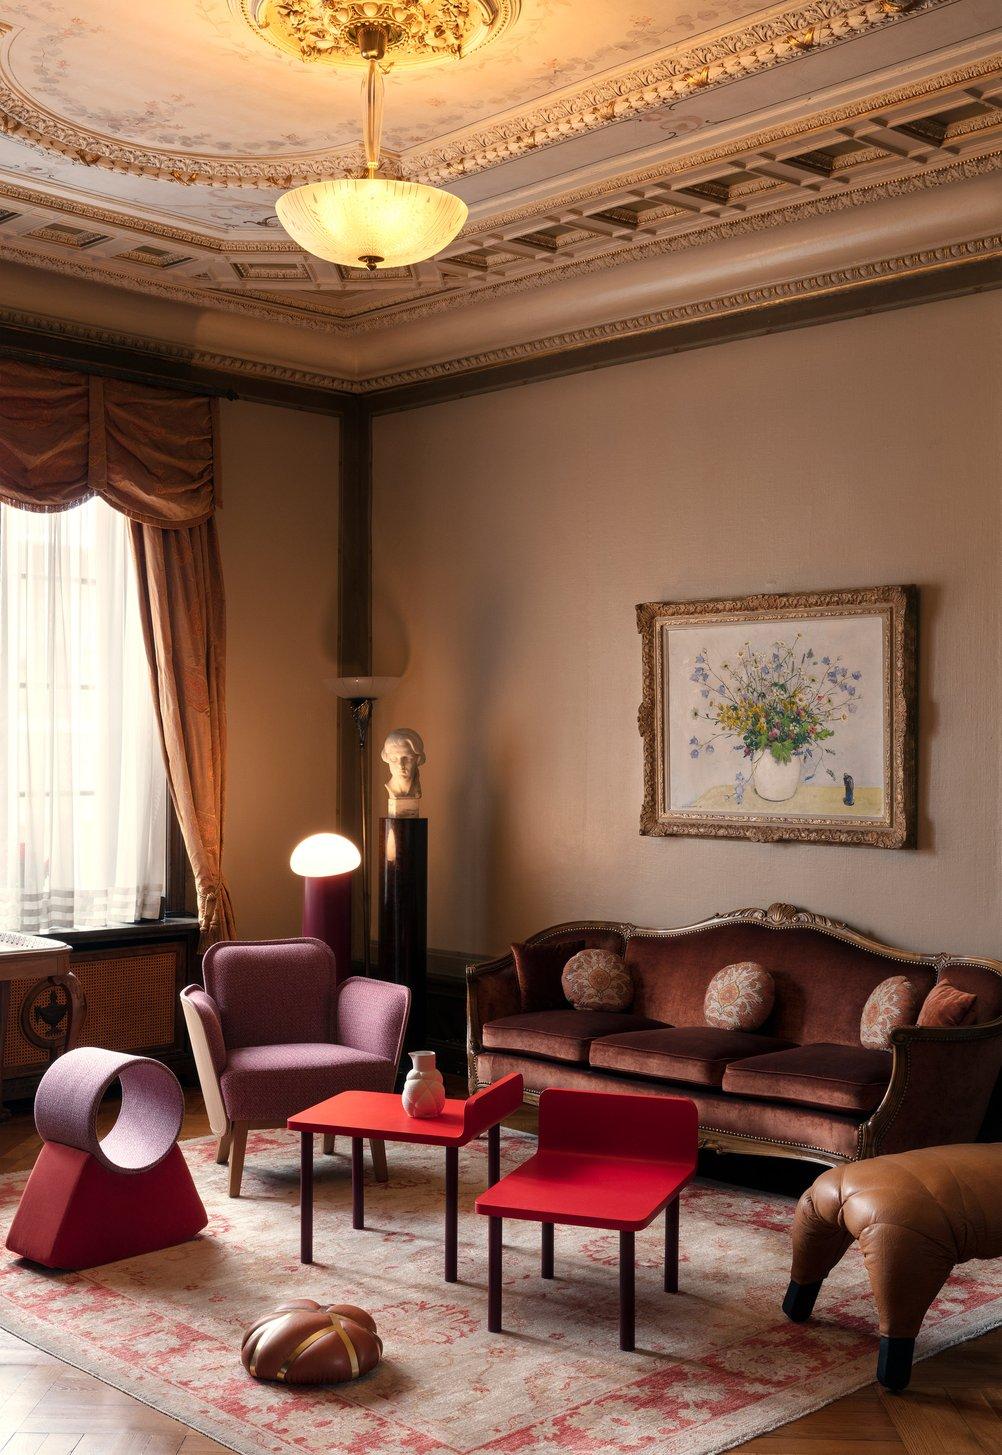 bakers-house-stockholm-design-week-farg-blanche-interiors-installations-_dezeen_2364_col_11